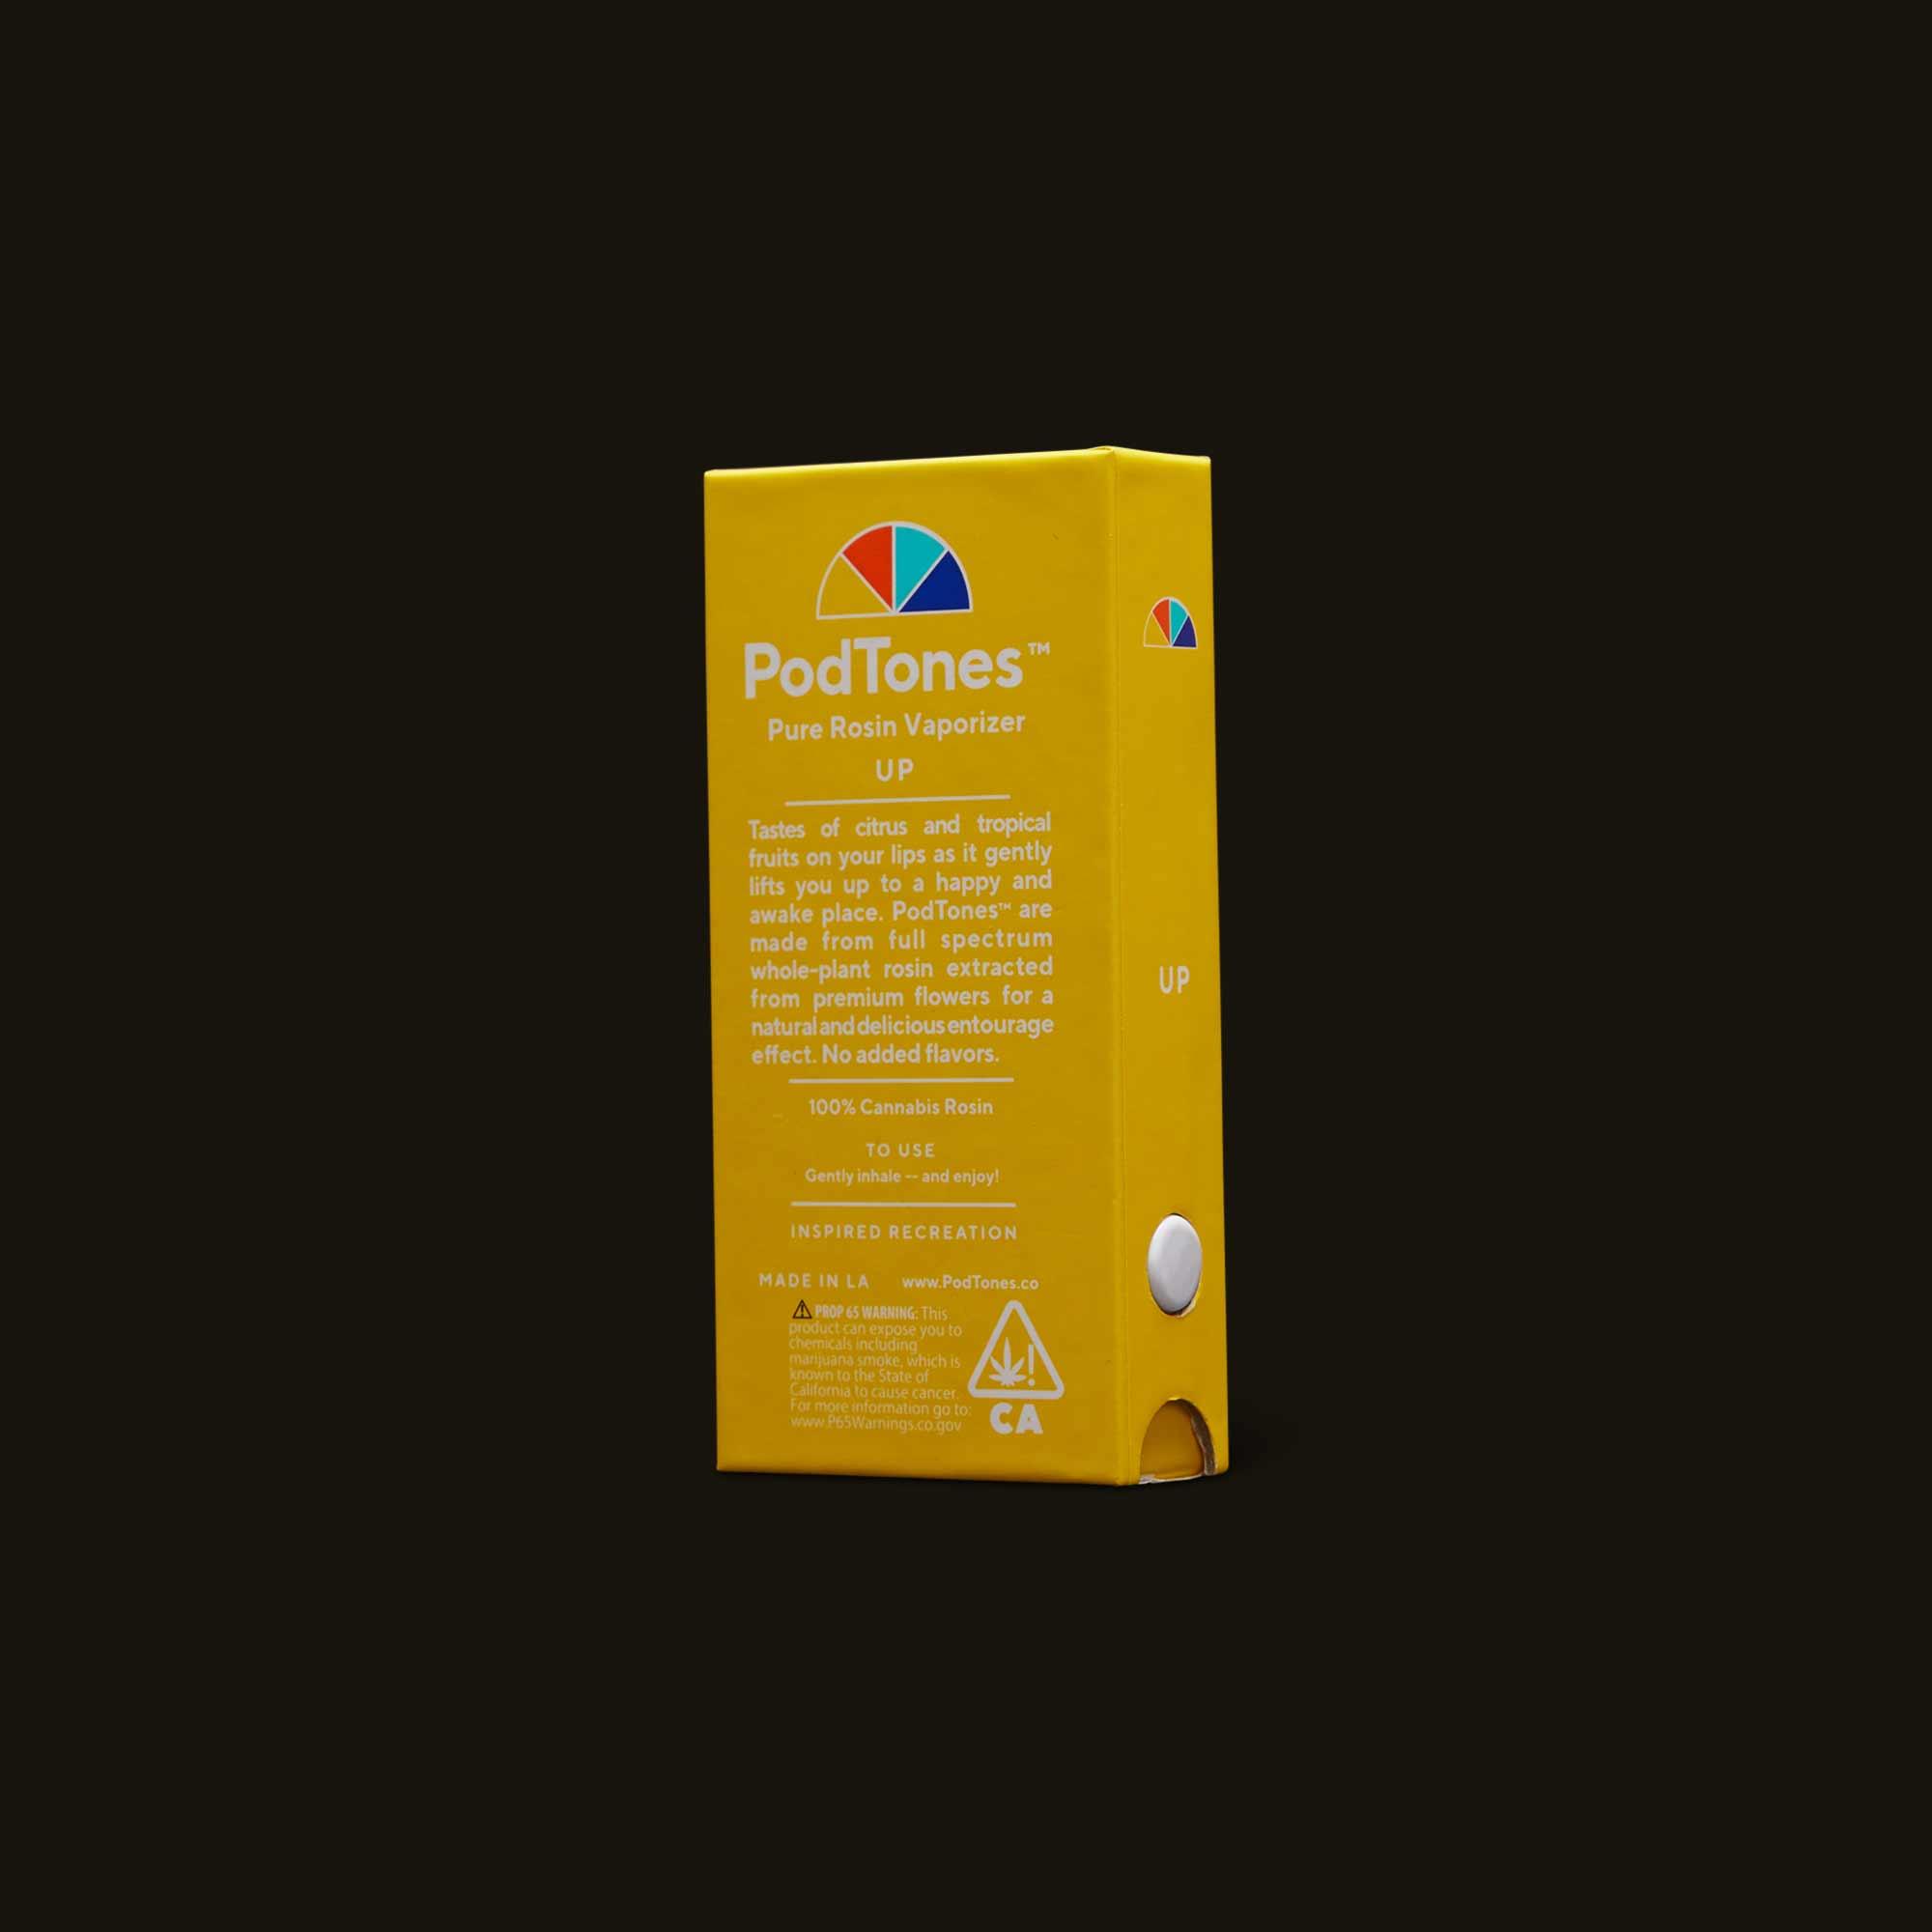 PodTones Up Pure Rosin Vaporizer